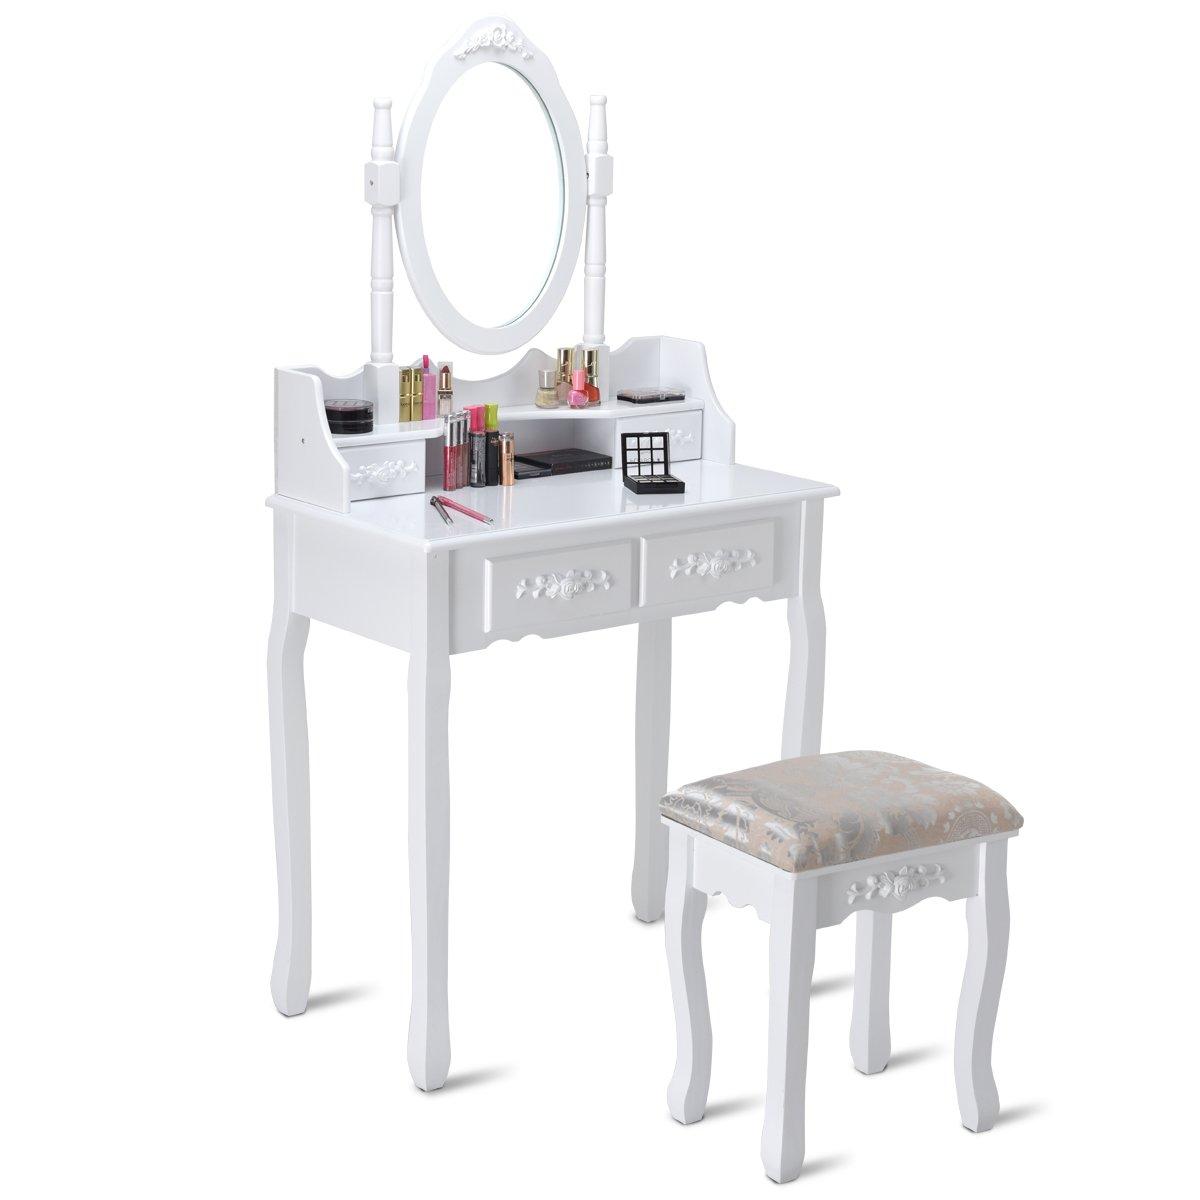 Giantex White Bathroom Vanity Jewelry Makeup Dressing Table Set W/Stool Mirror Wood Desk (4 Drawers)